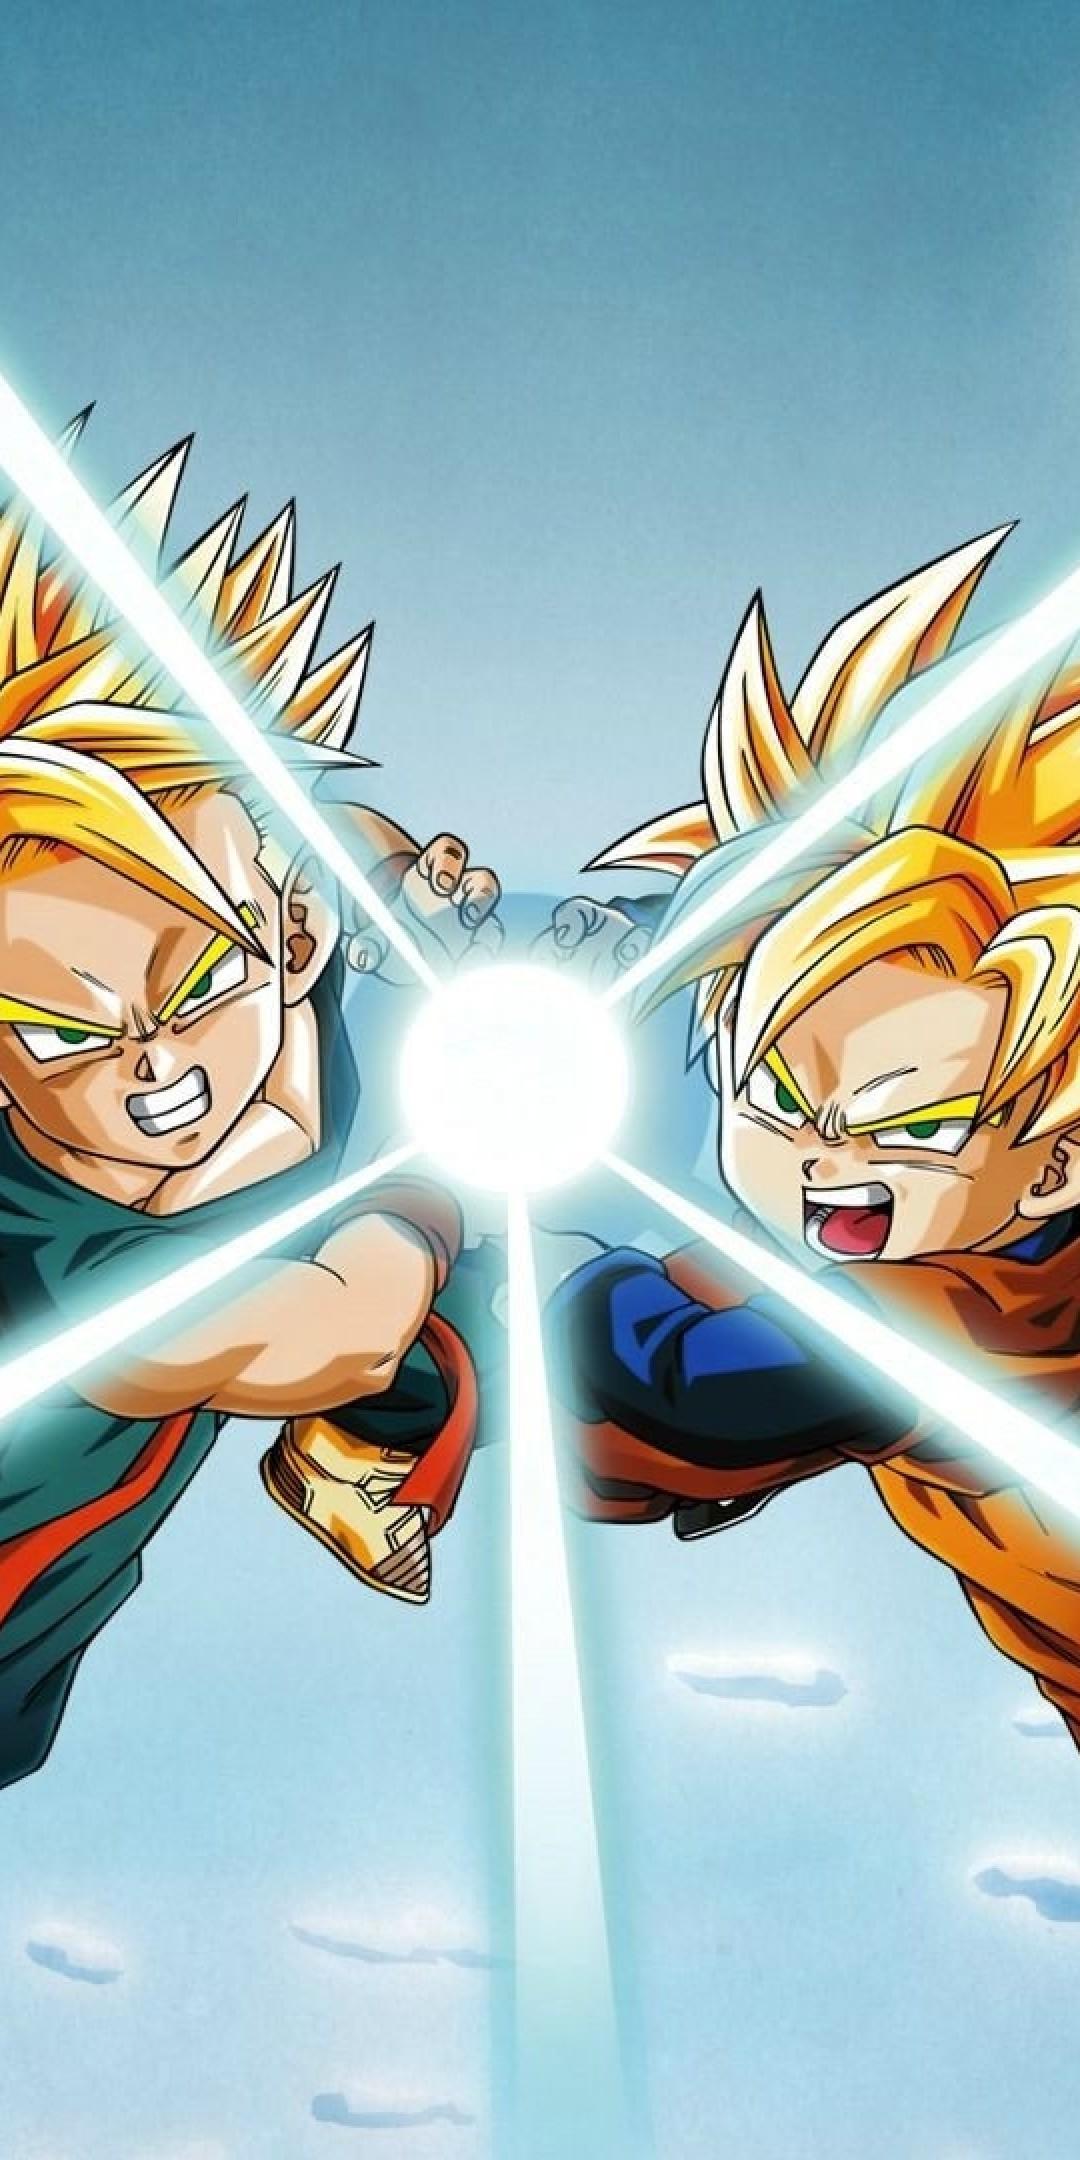 Dragon Ball Z Trunks Goten Super Saiyan Mode Dragon Ball Z Wallpaper Iphone 11 2994763 Hd Wallpaper Backgrounds Download